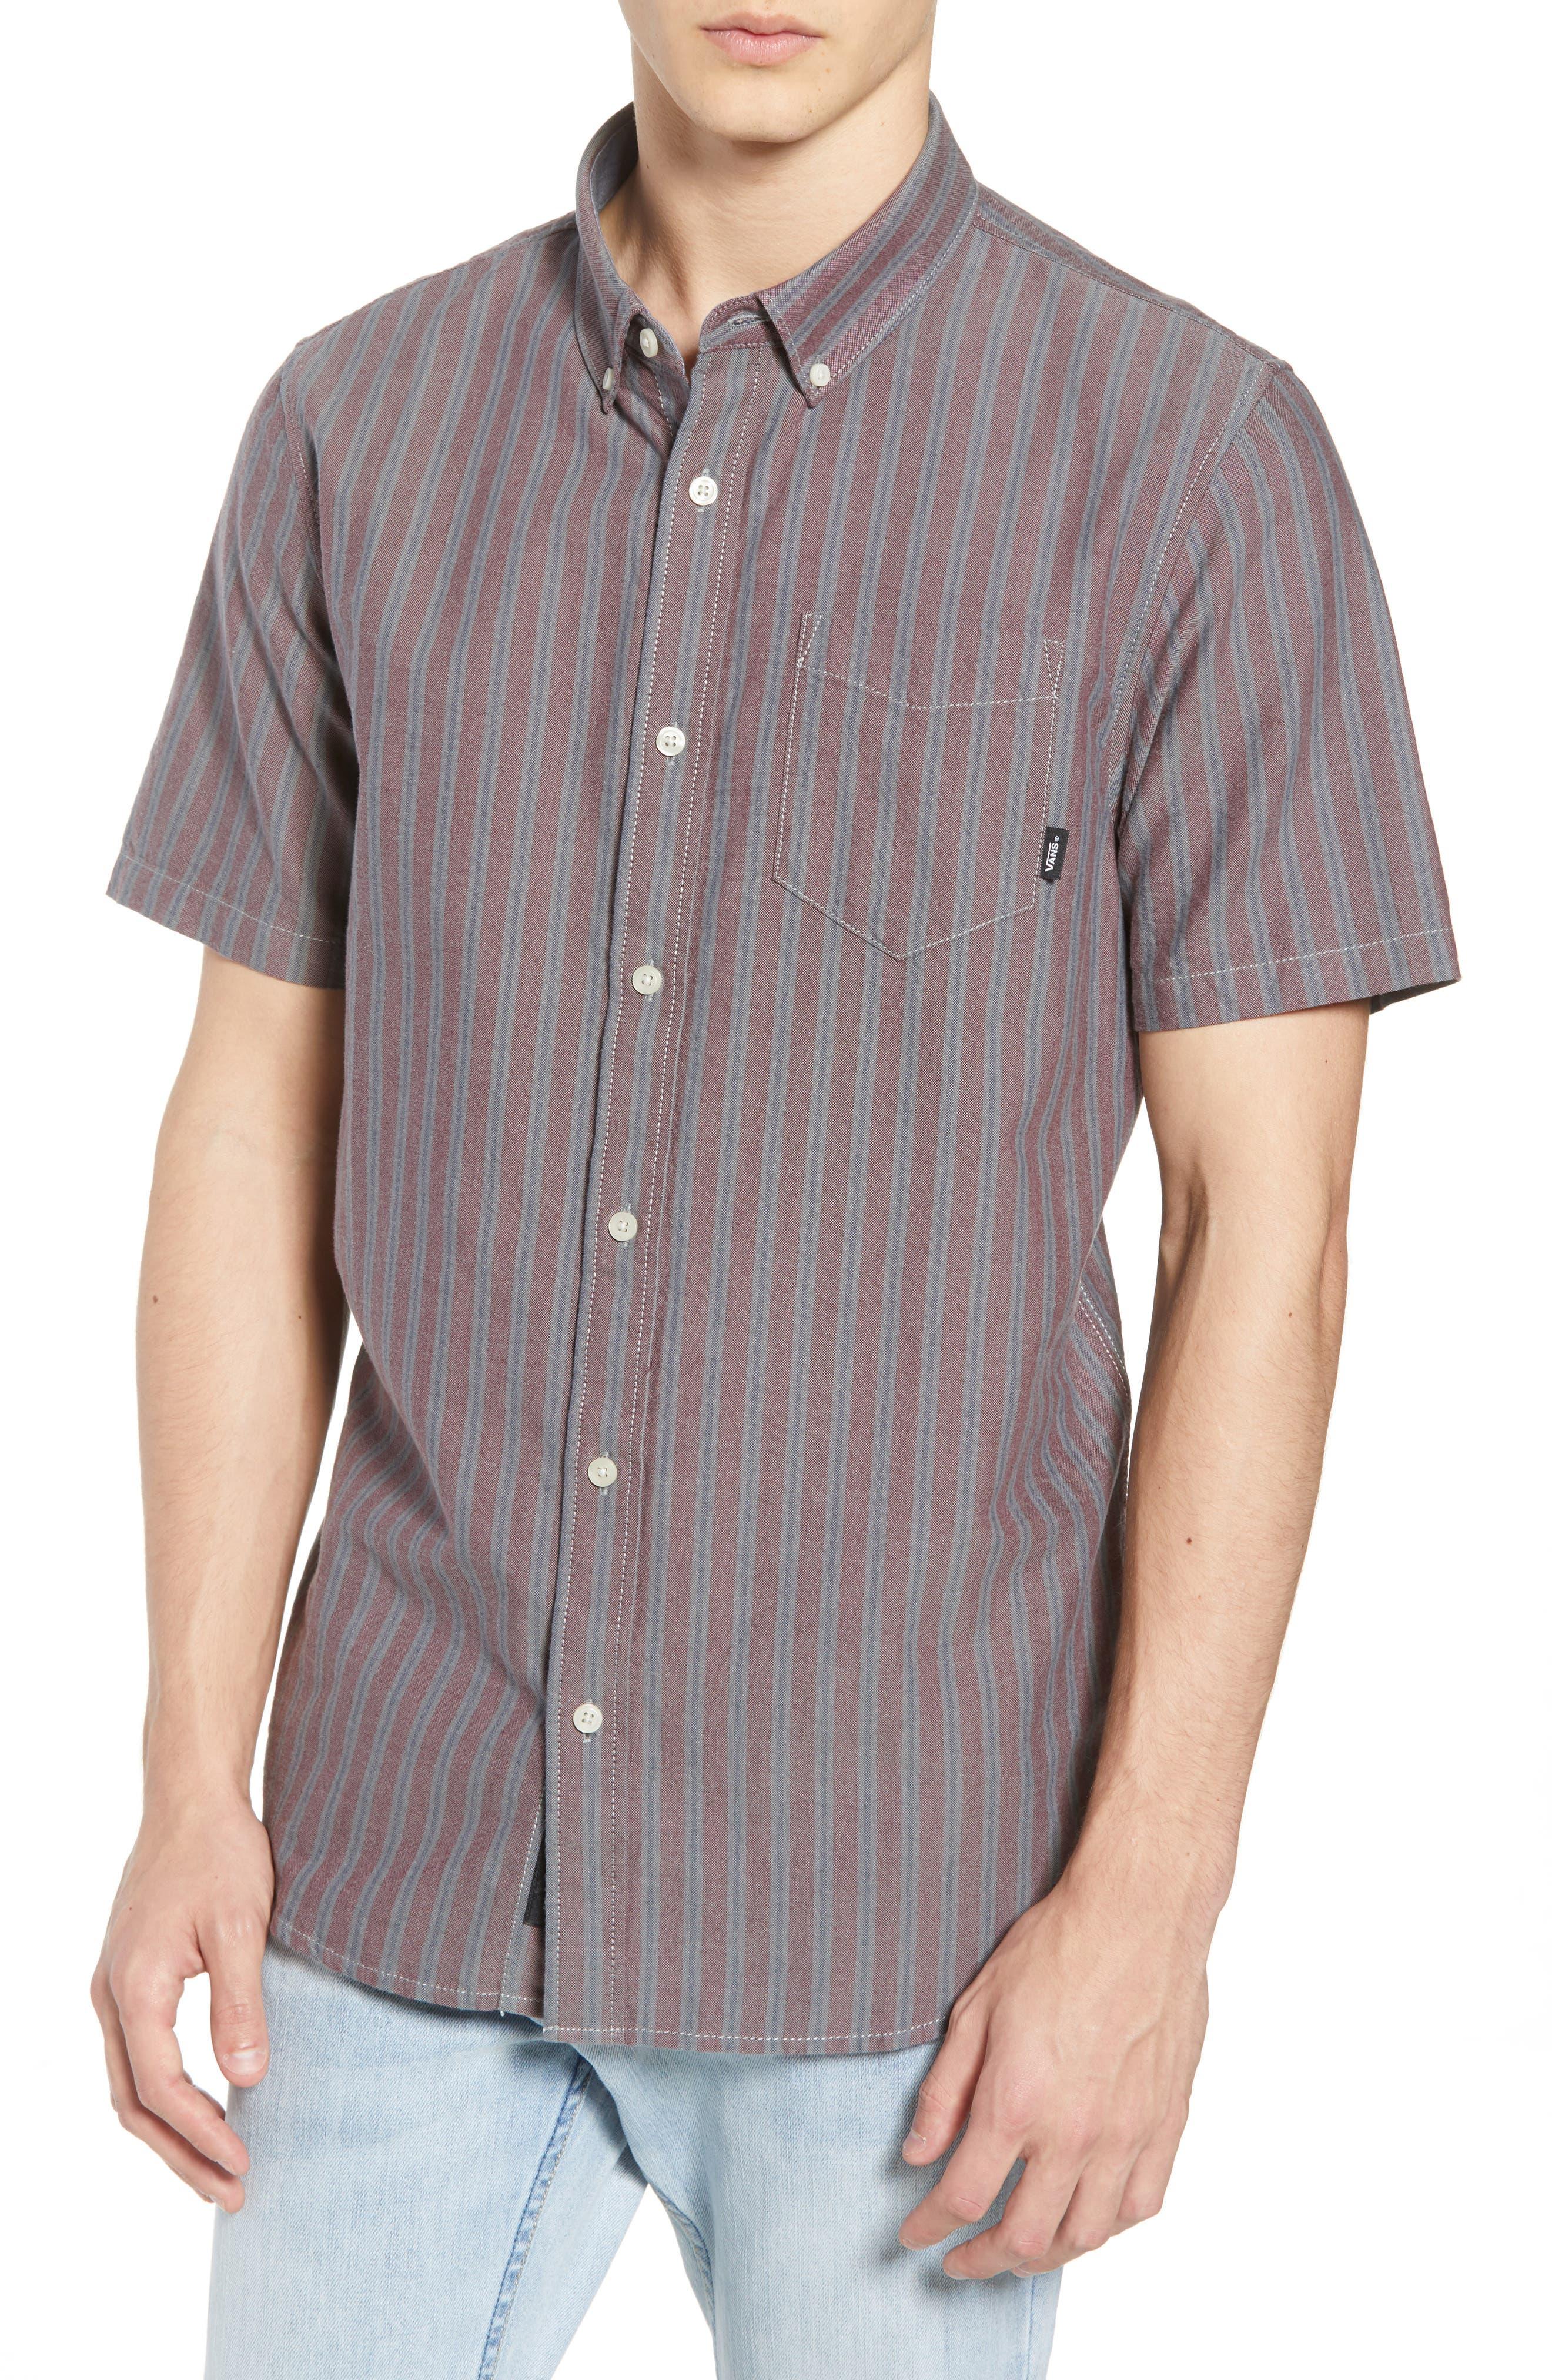 Houser Woven Shirt,                         Main,                         color, PORT ROYALE STRIPE